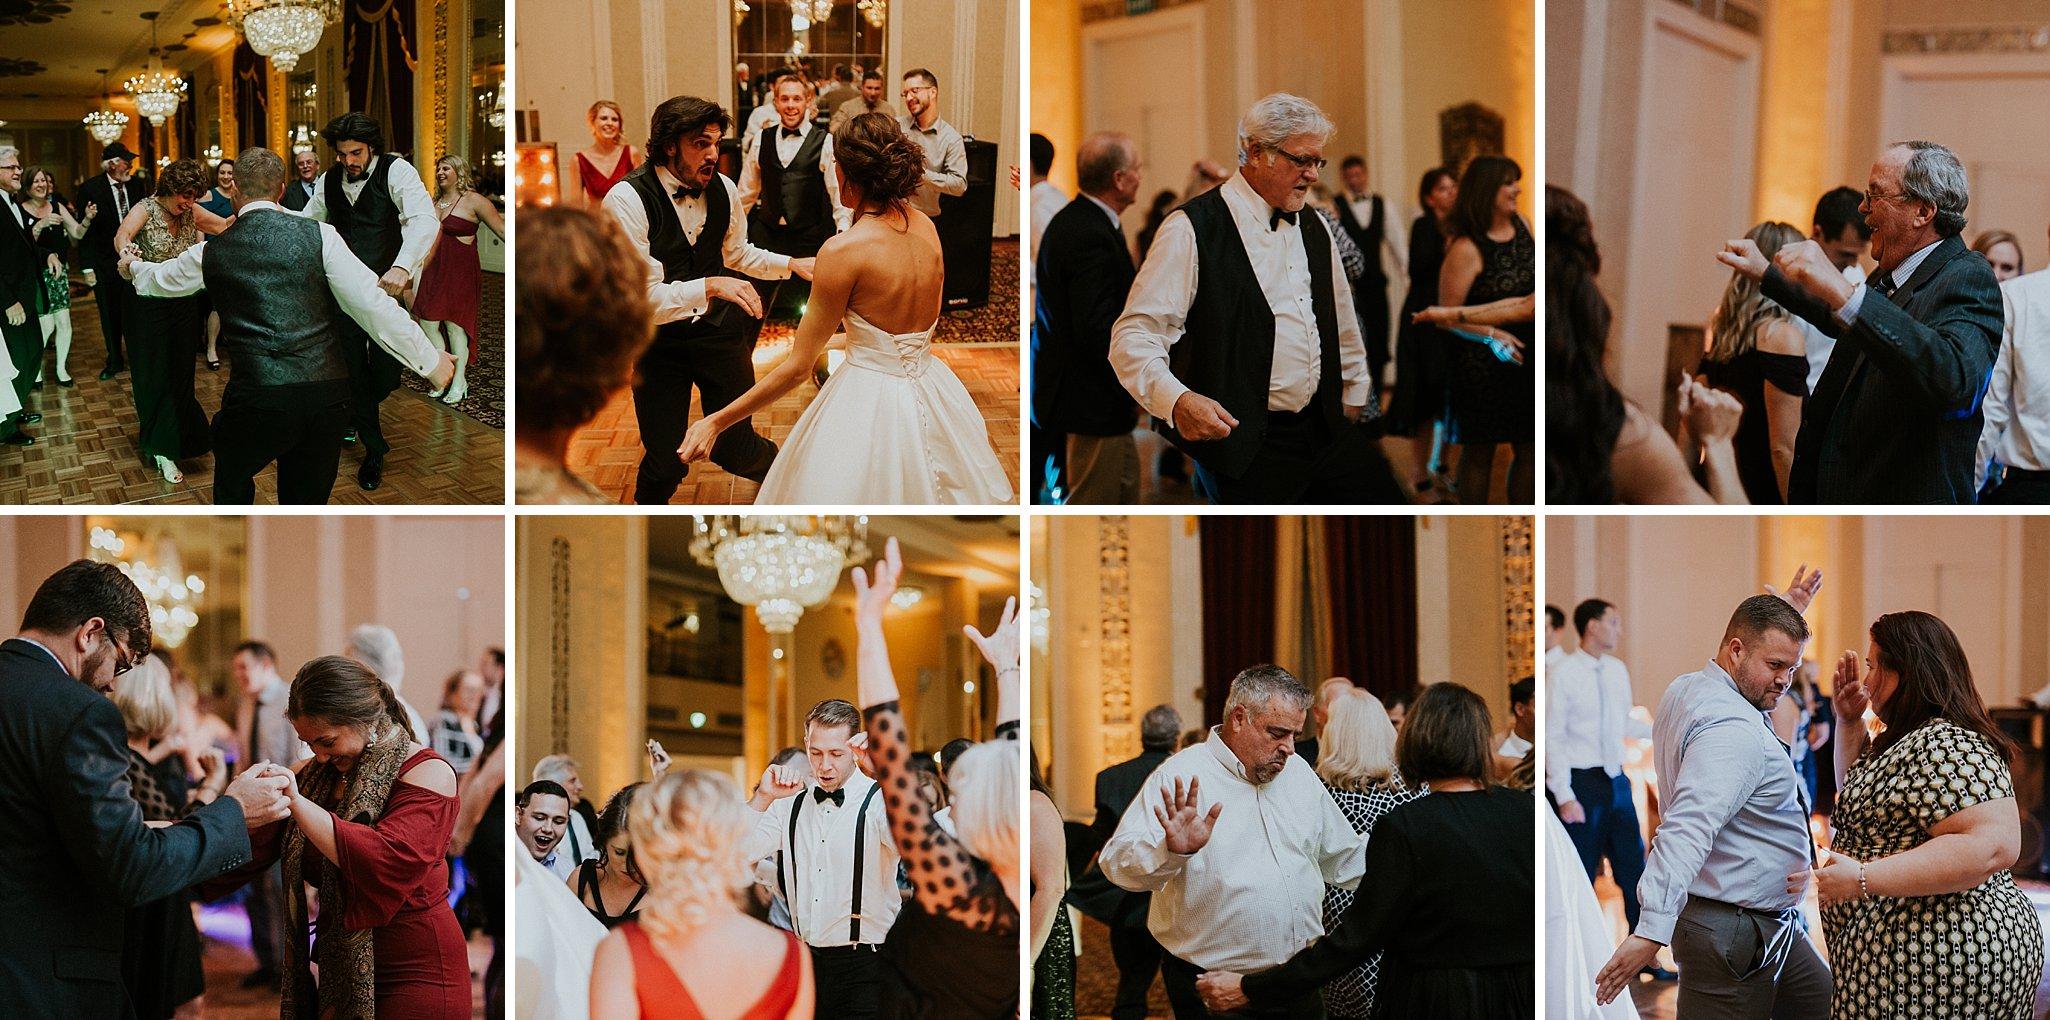 Matt-Lauren_St-Marys_Hilton-City-Center-Milwaukee-Wedding_liller-photo_0092.jpg